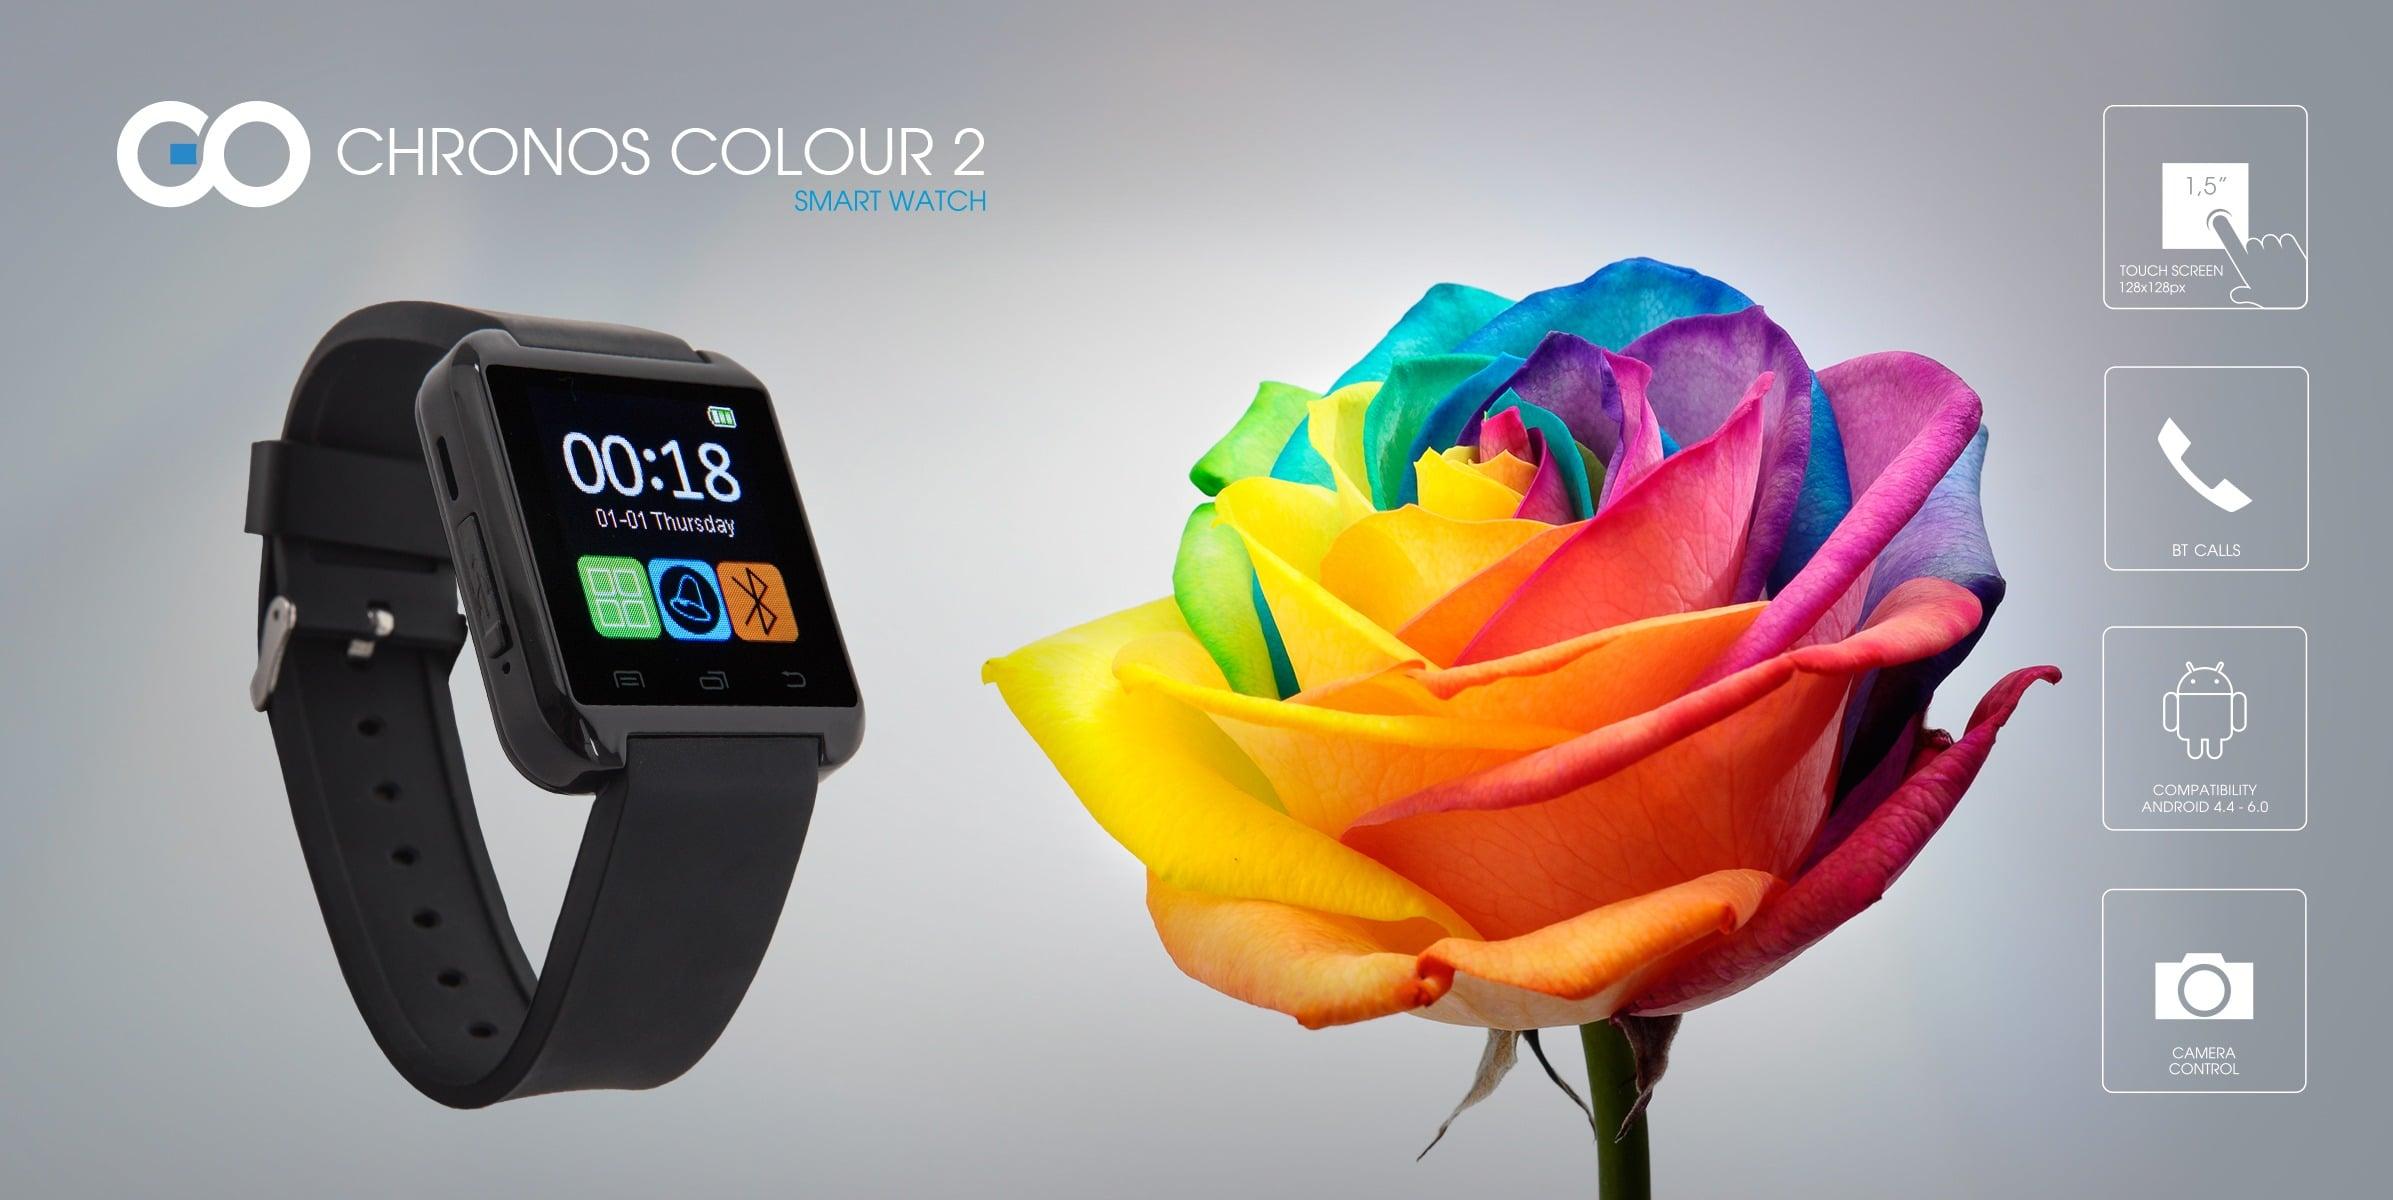 Dwa nowe smartwatche od GOCLEVER: Chronos Connect 2 i Chronos Colour 2 18